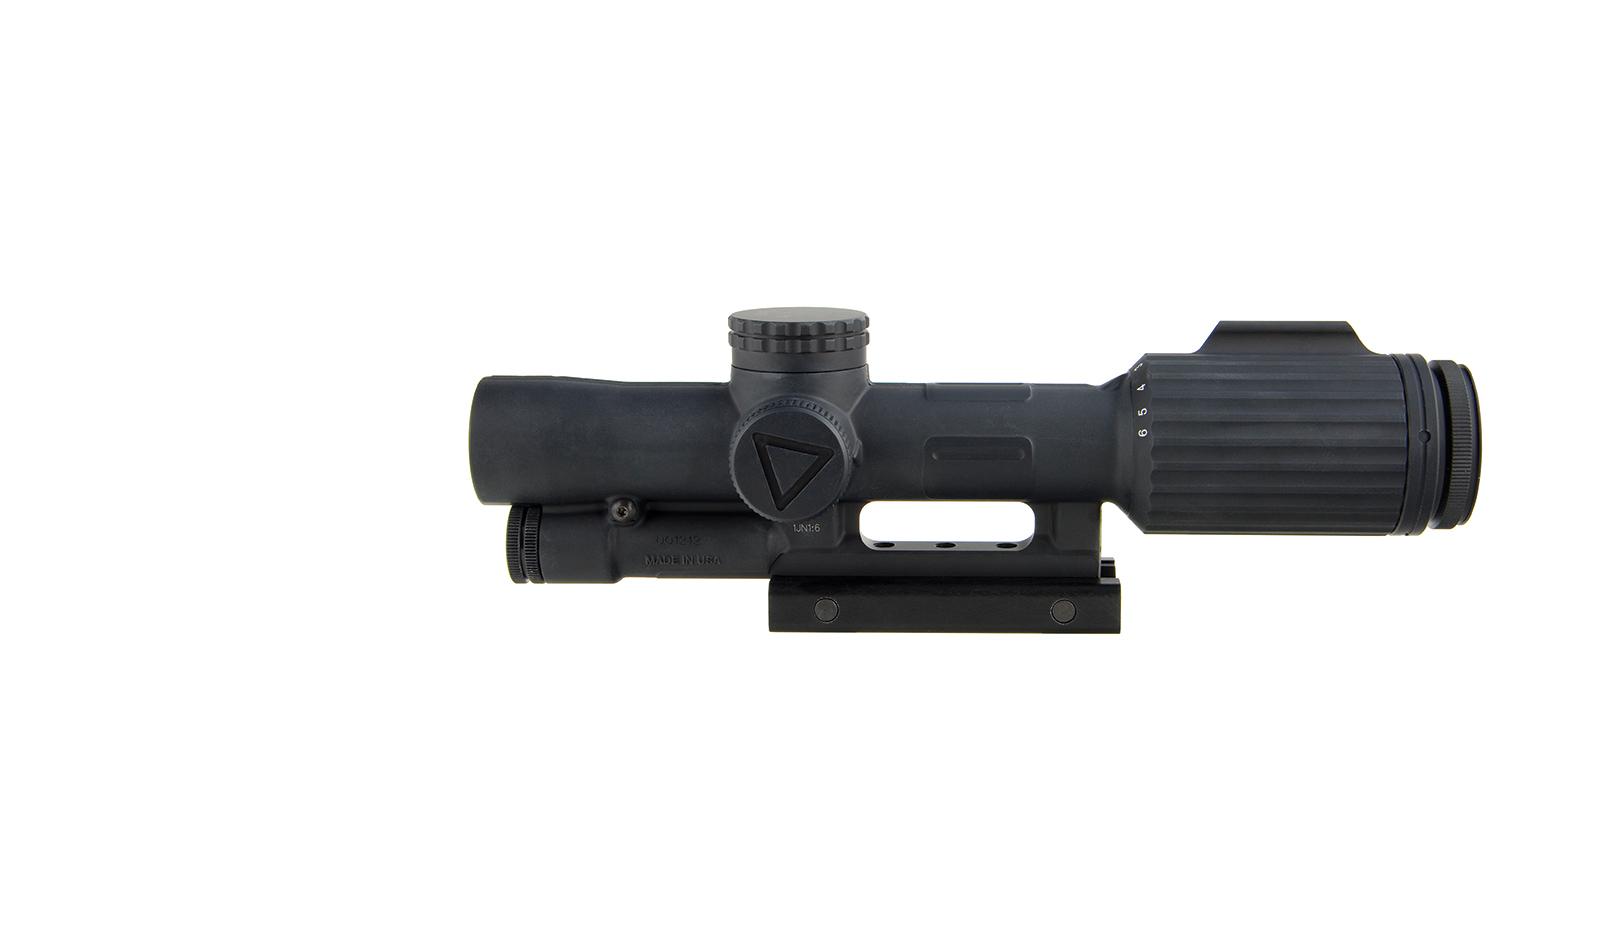 VC16-C-1600036 angle 2